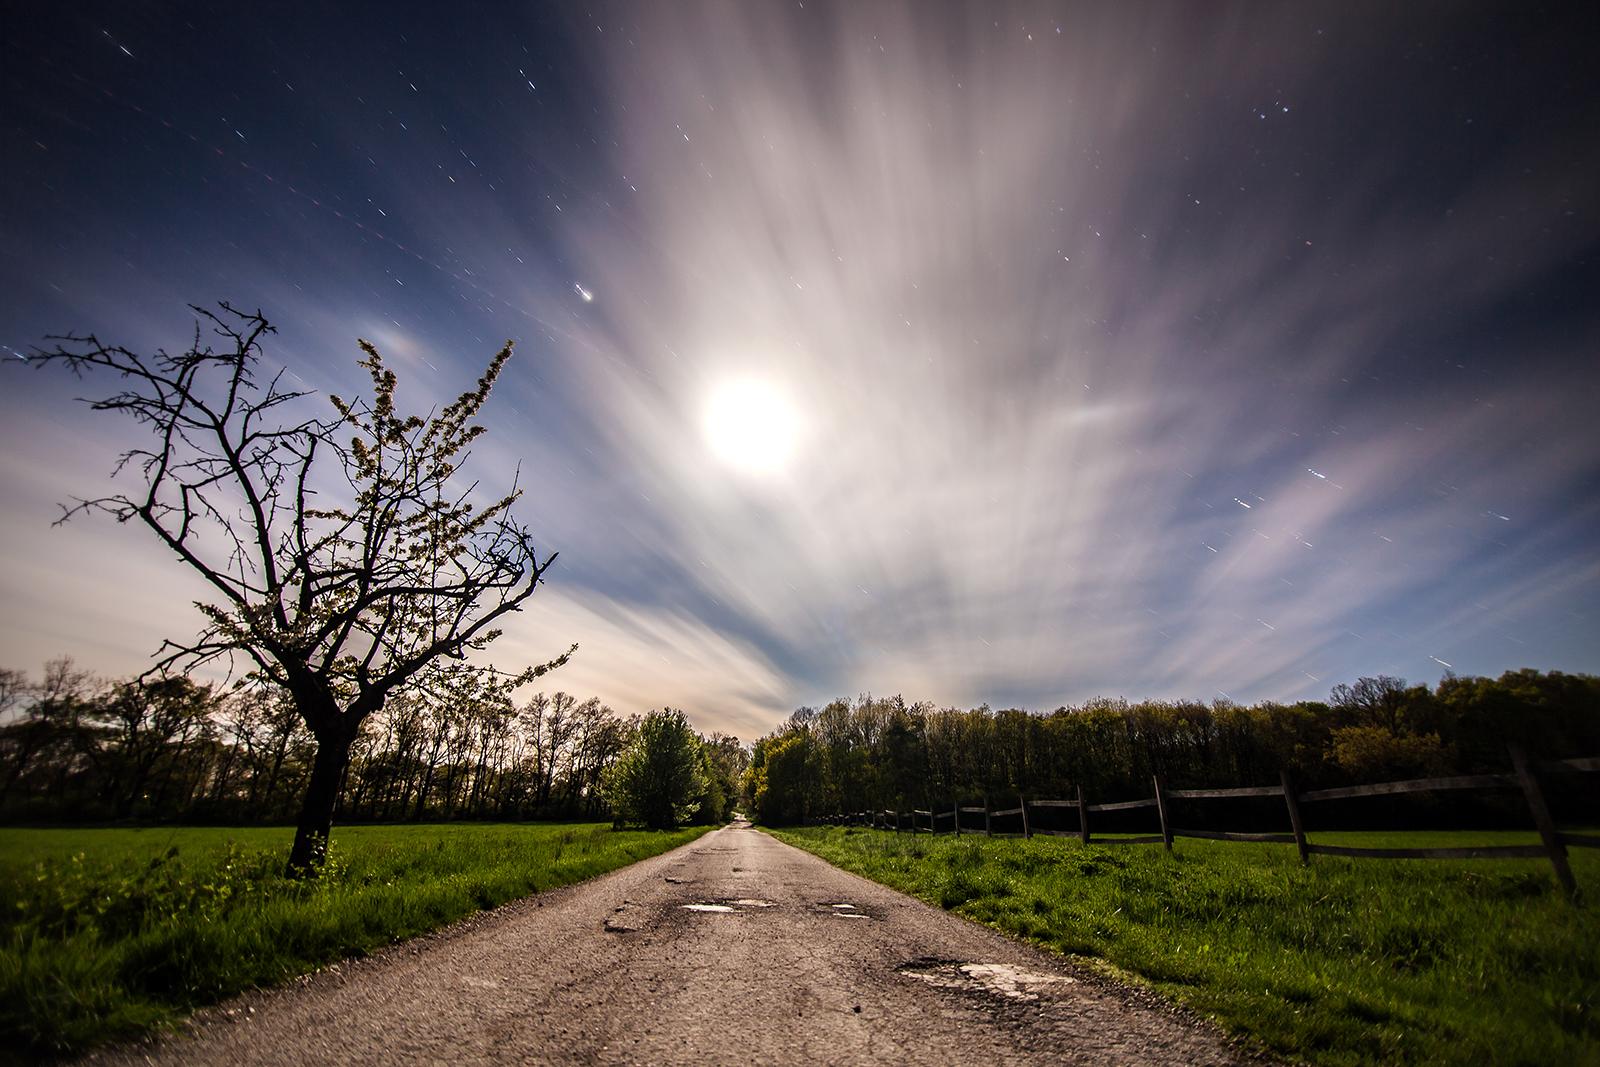 beautiful as night